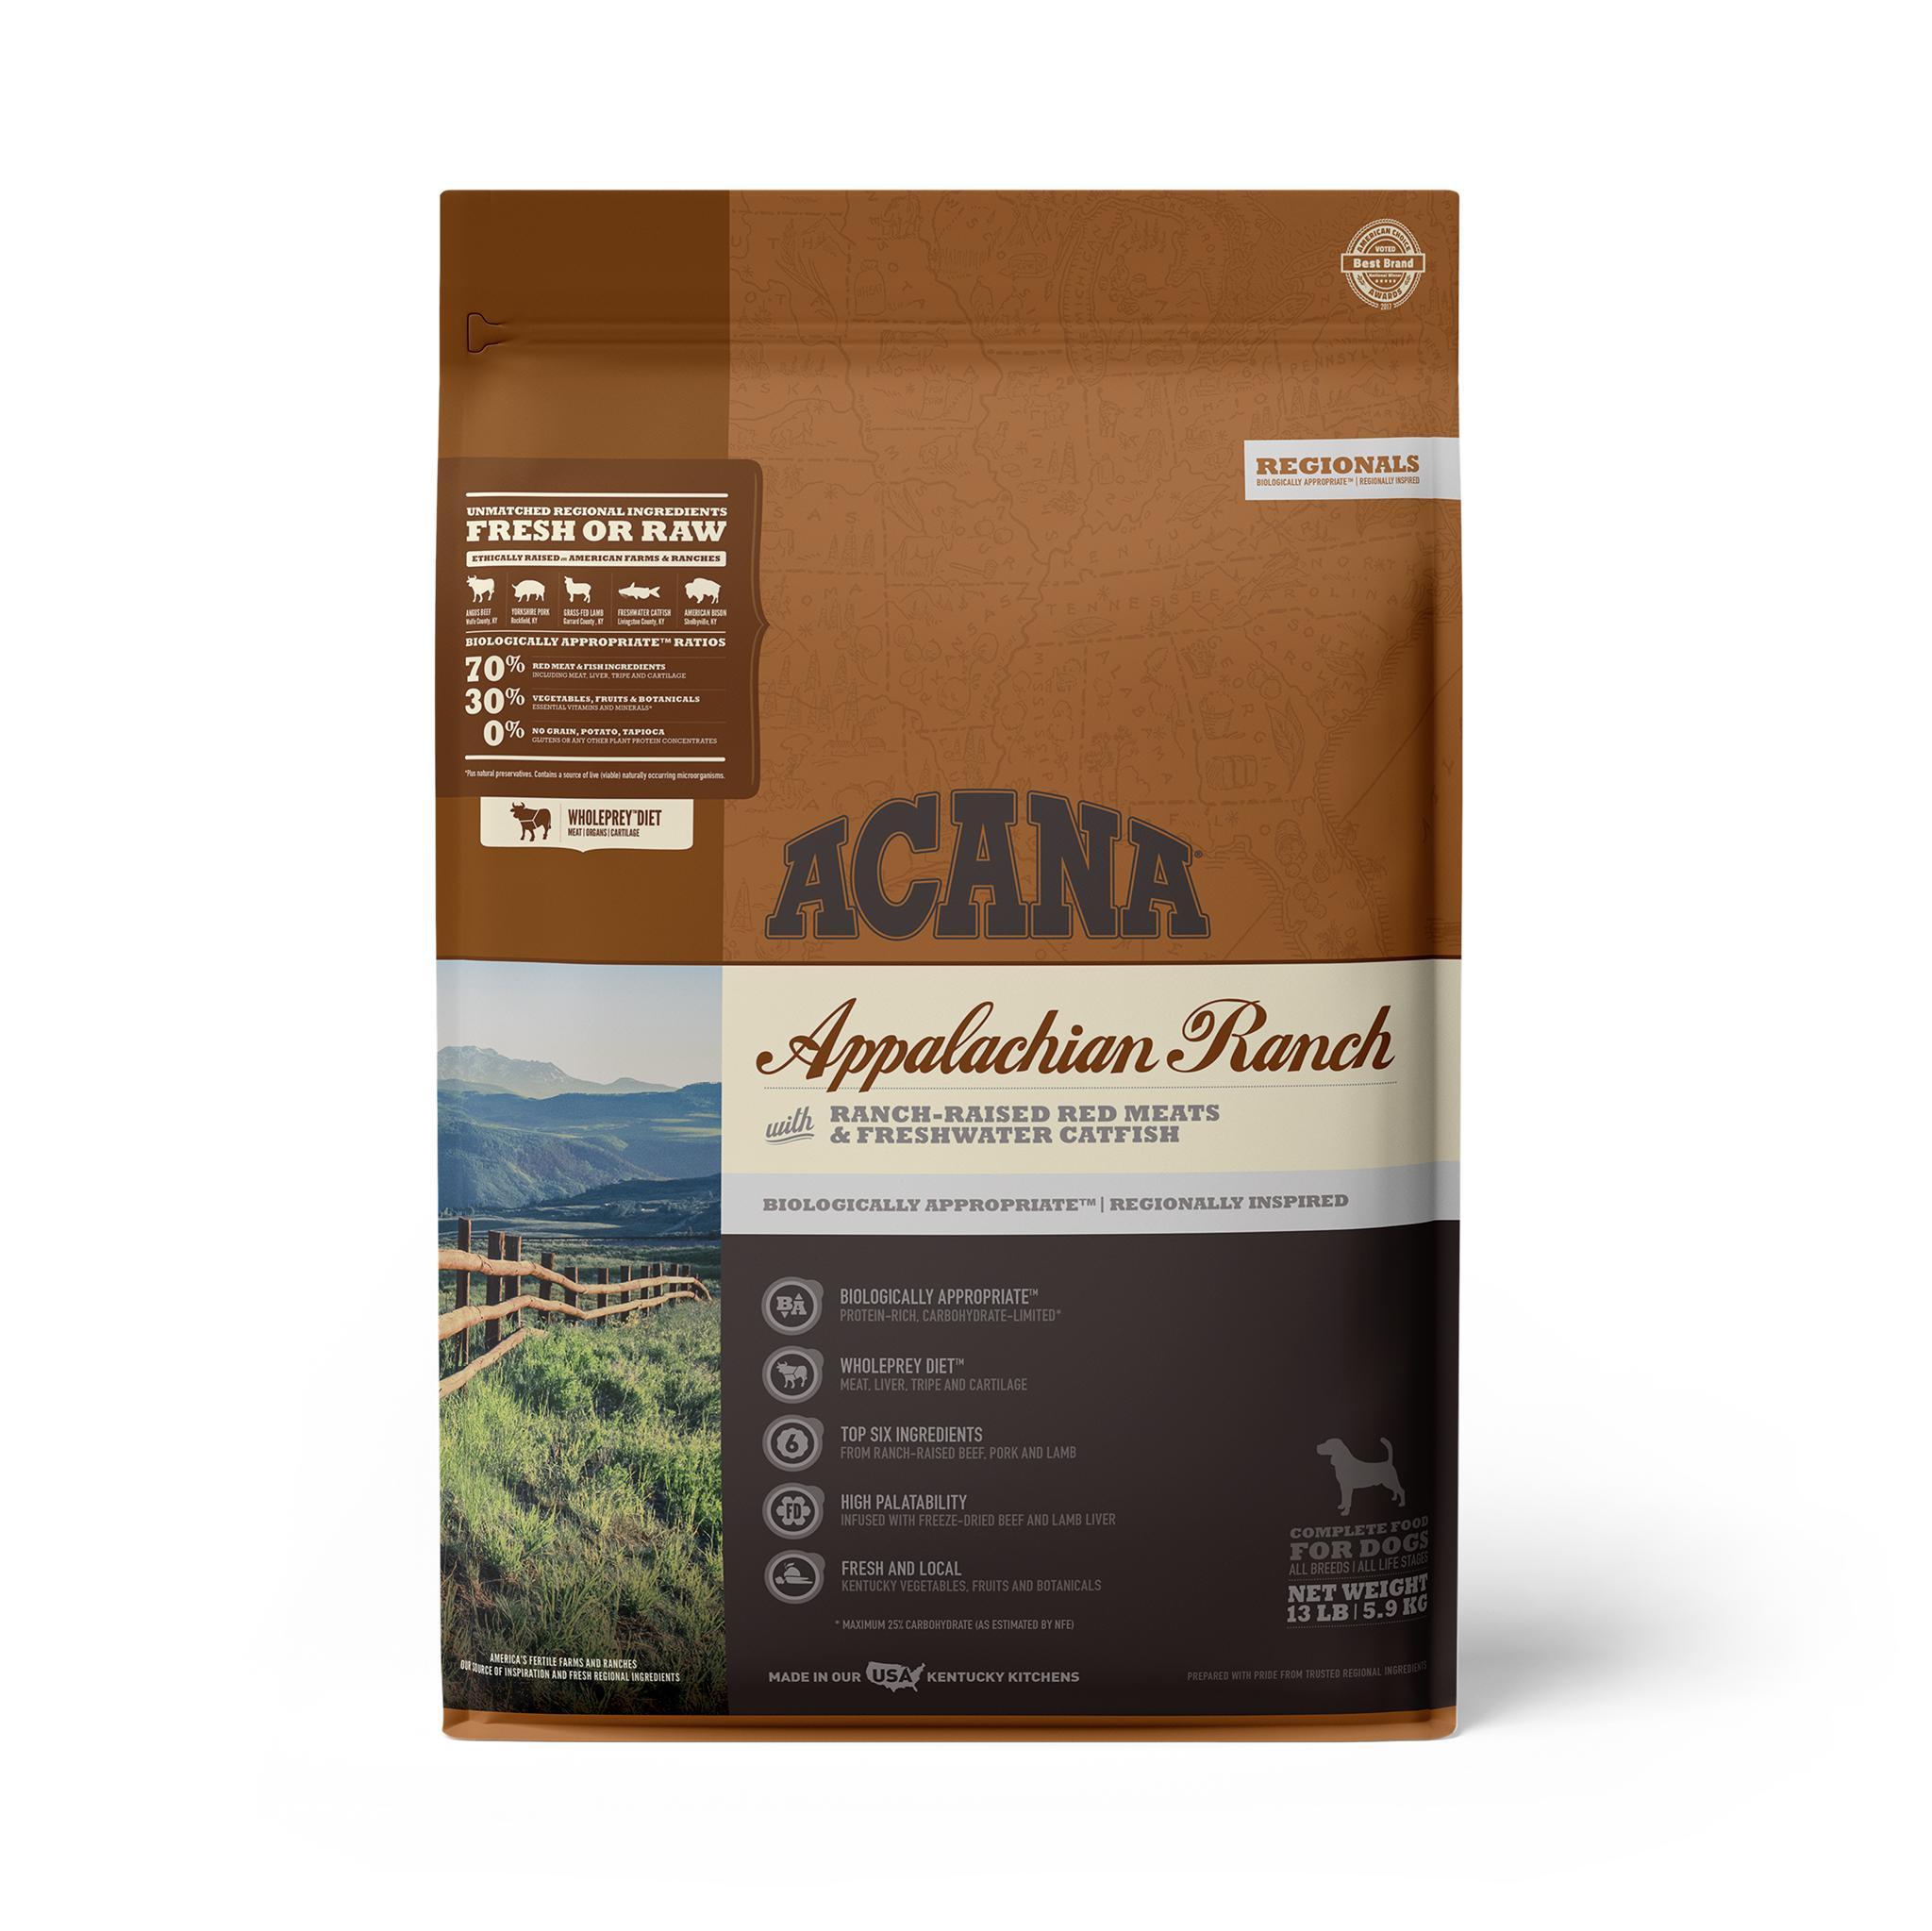 ACANA Regionals Appalachian Ranch Grain-Free Dry Dog Food, 13-lb